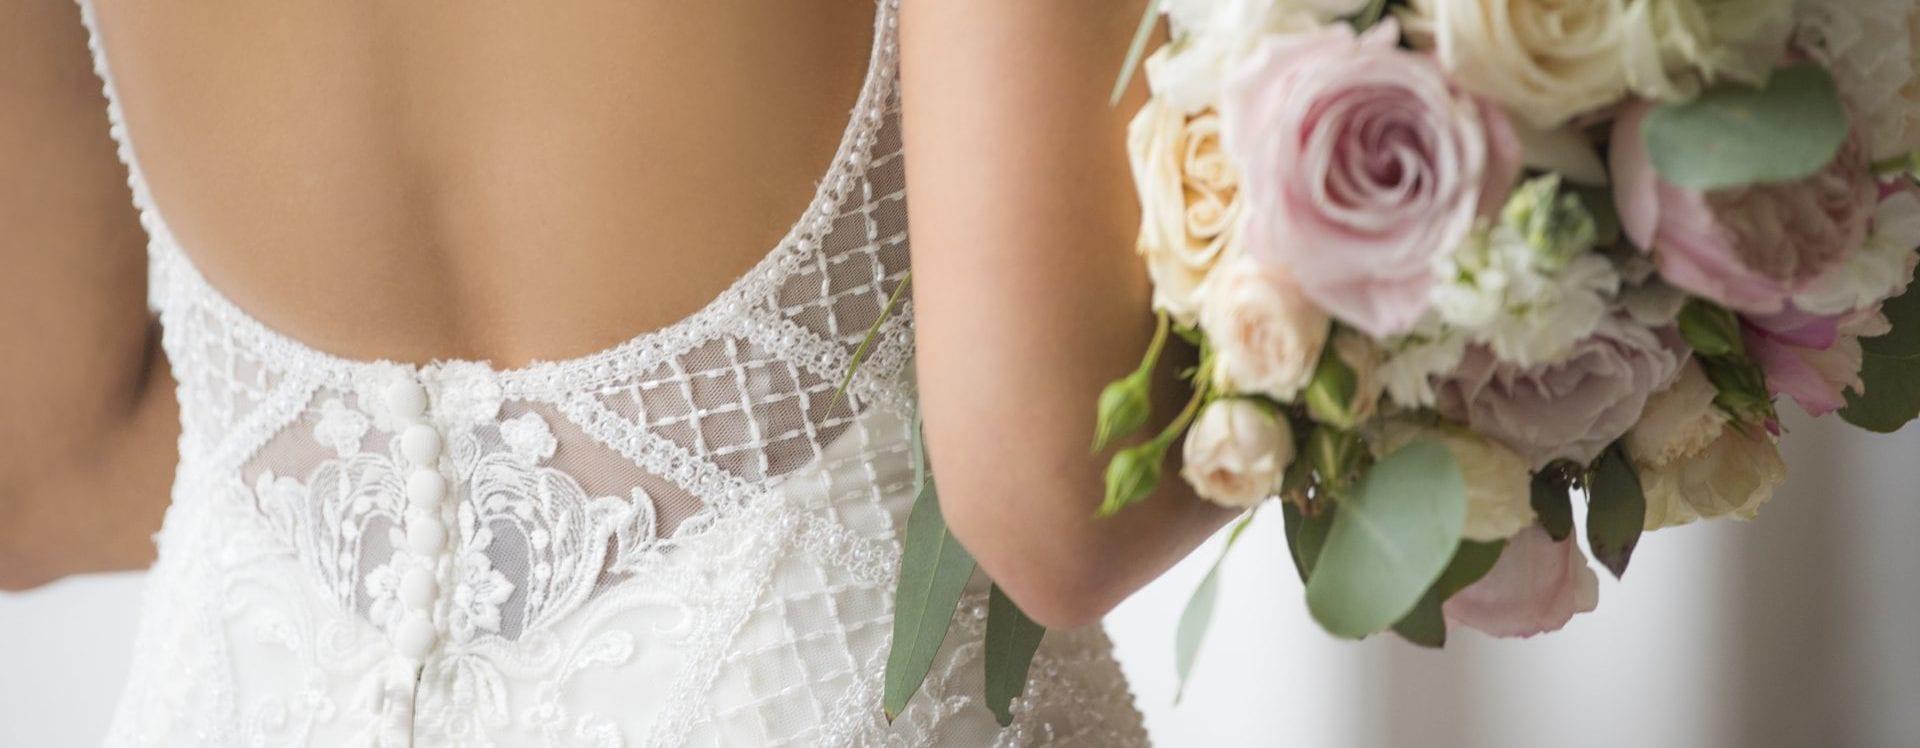 Designer Wedding Dresses at Gown Boutique of Charleston